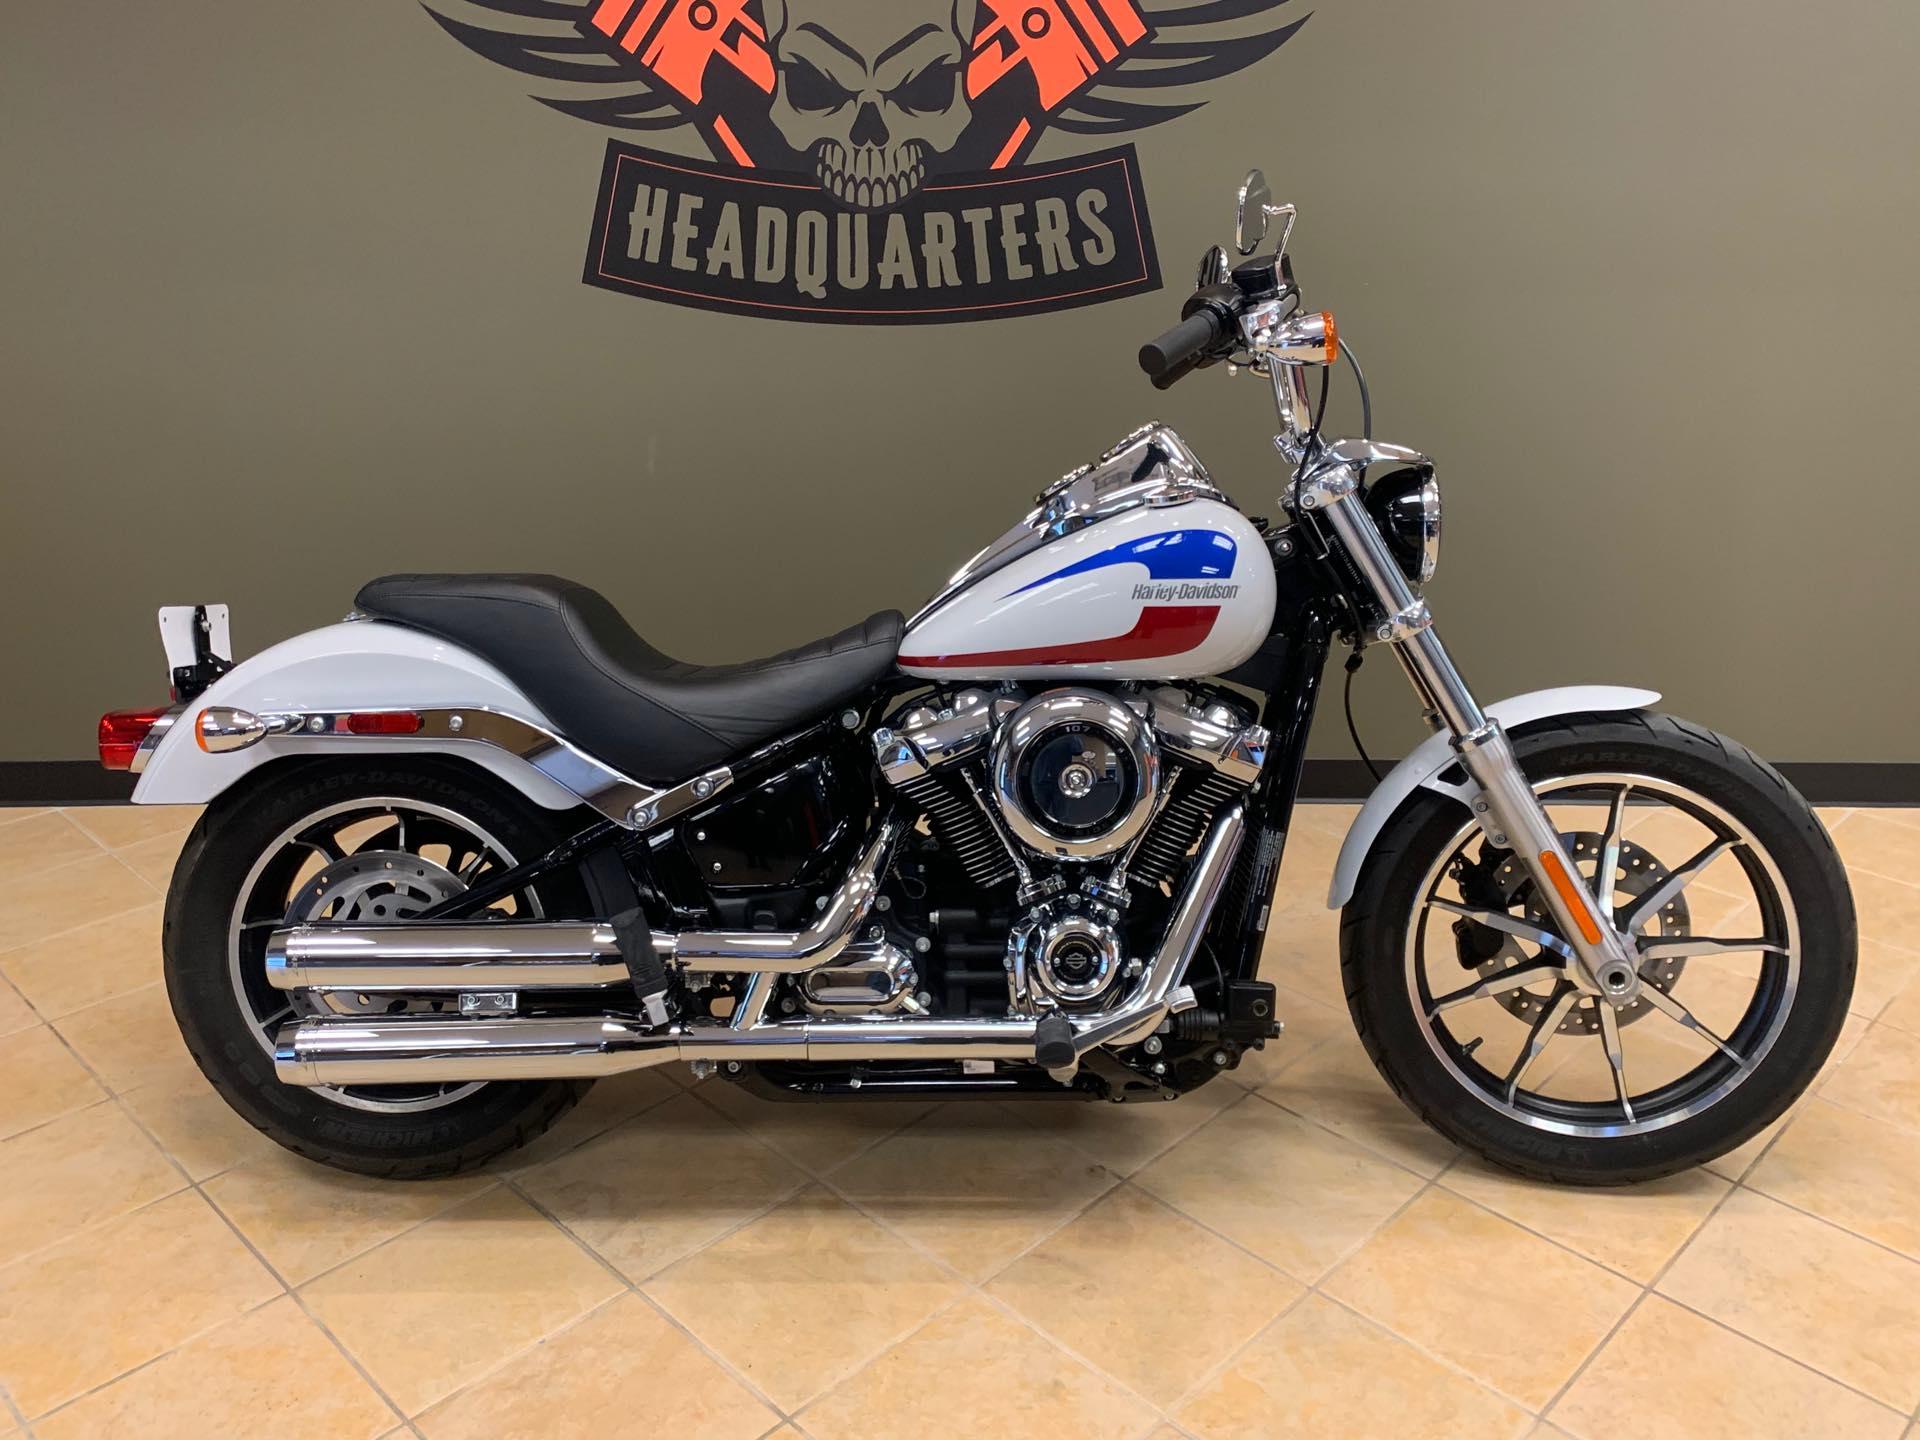 2020 Harley-Davidson Softail Low Rider at Loess Hills Harley-Davidson